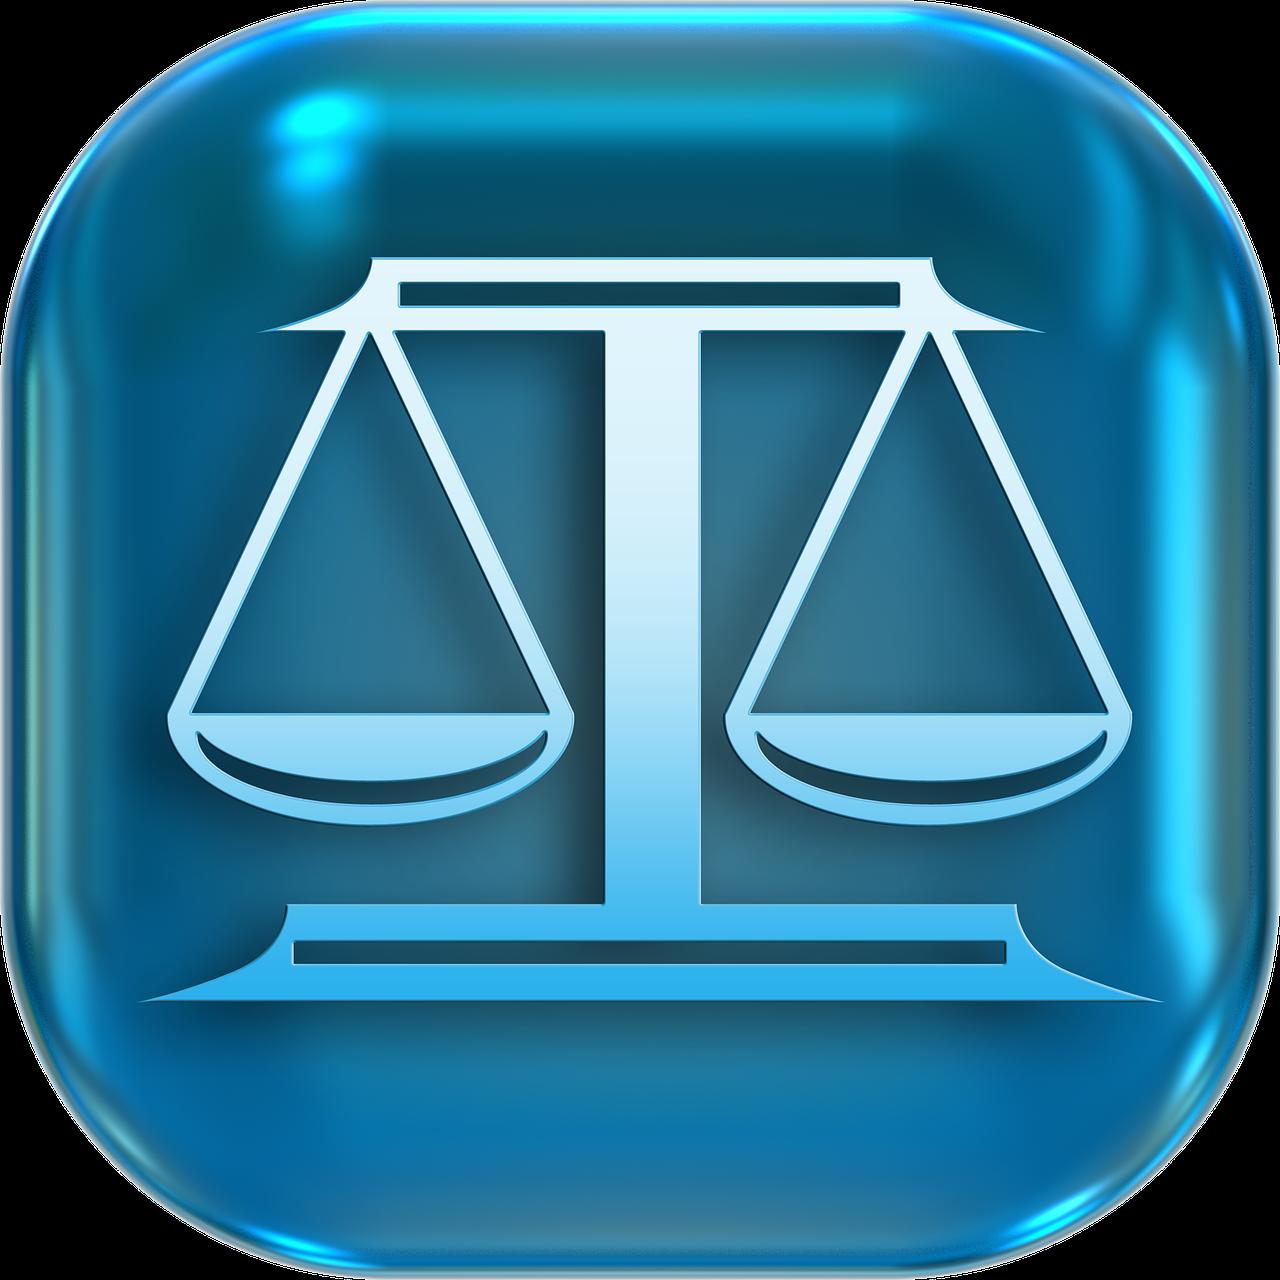 Icons Symbols Horizontal Justice  - geralt / Pixabay